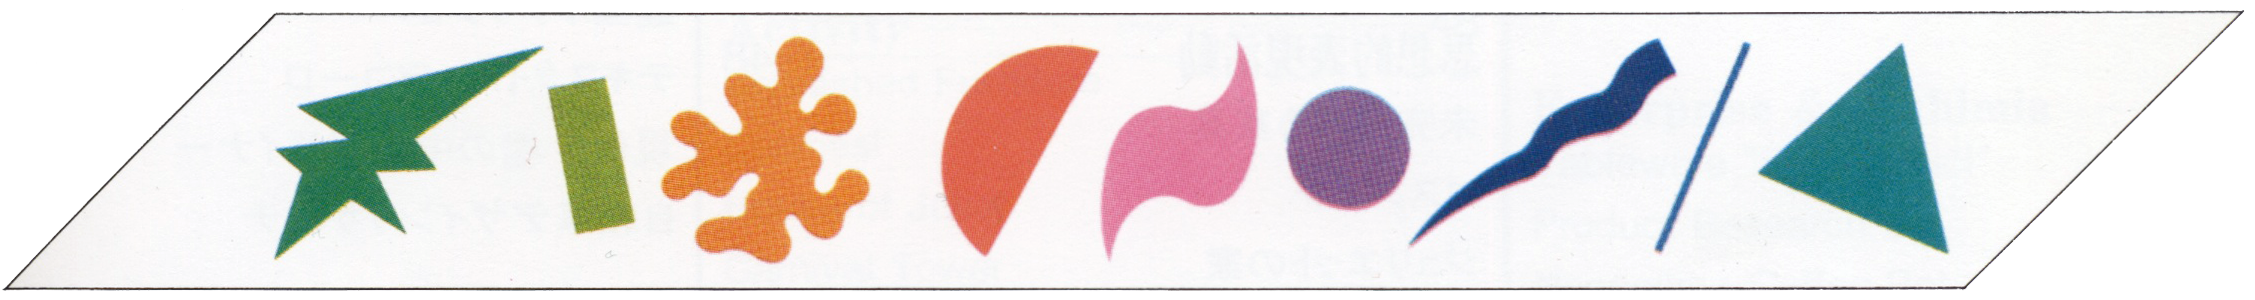 Alchimia Banner 1